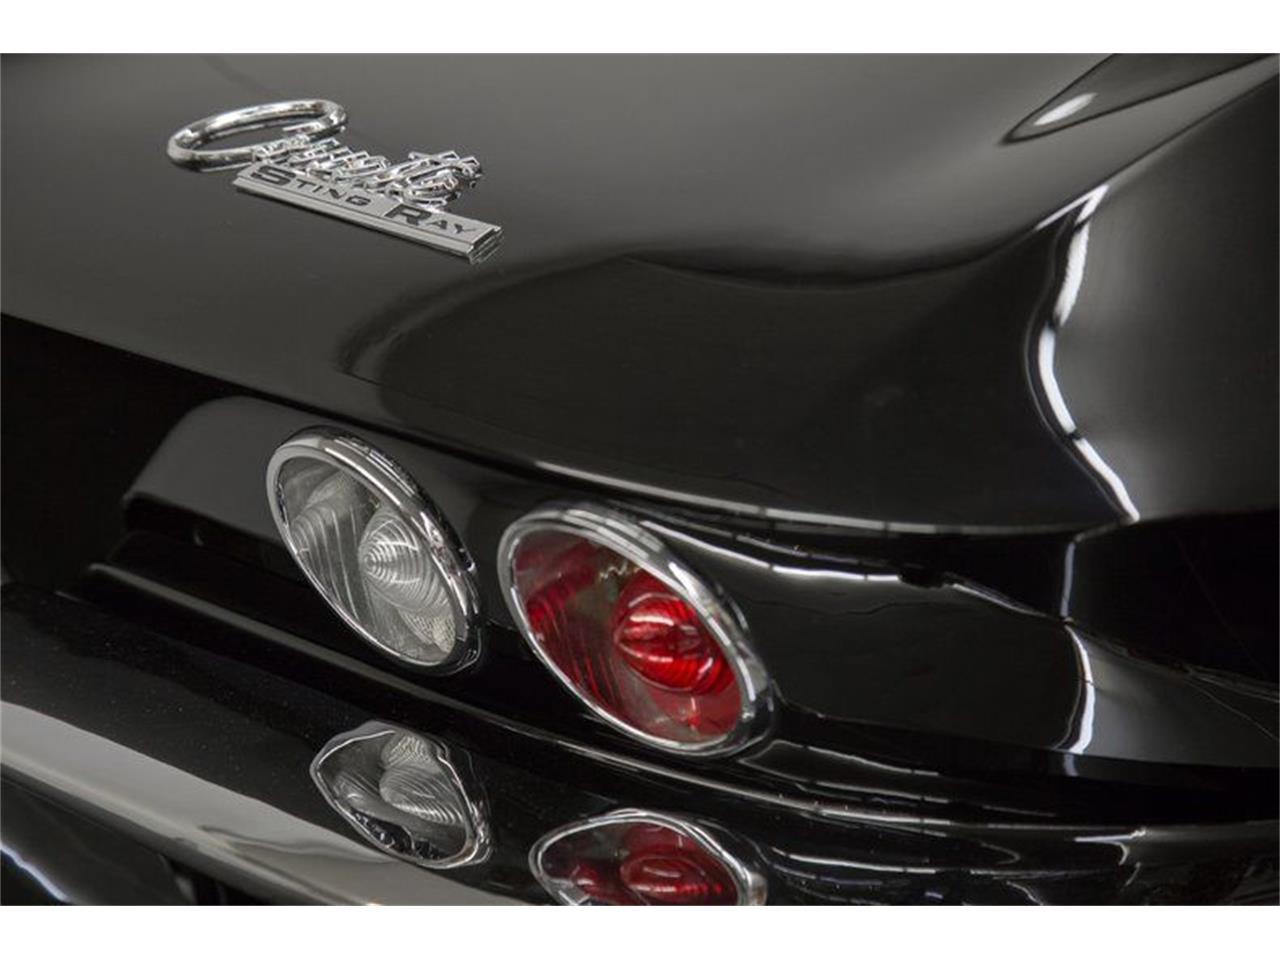 1965 Chevrolet Corvette Stingray (CC-1233760) for sale in St. Louis, Missouri